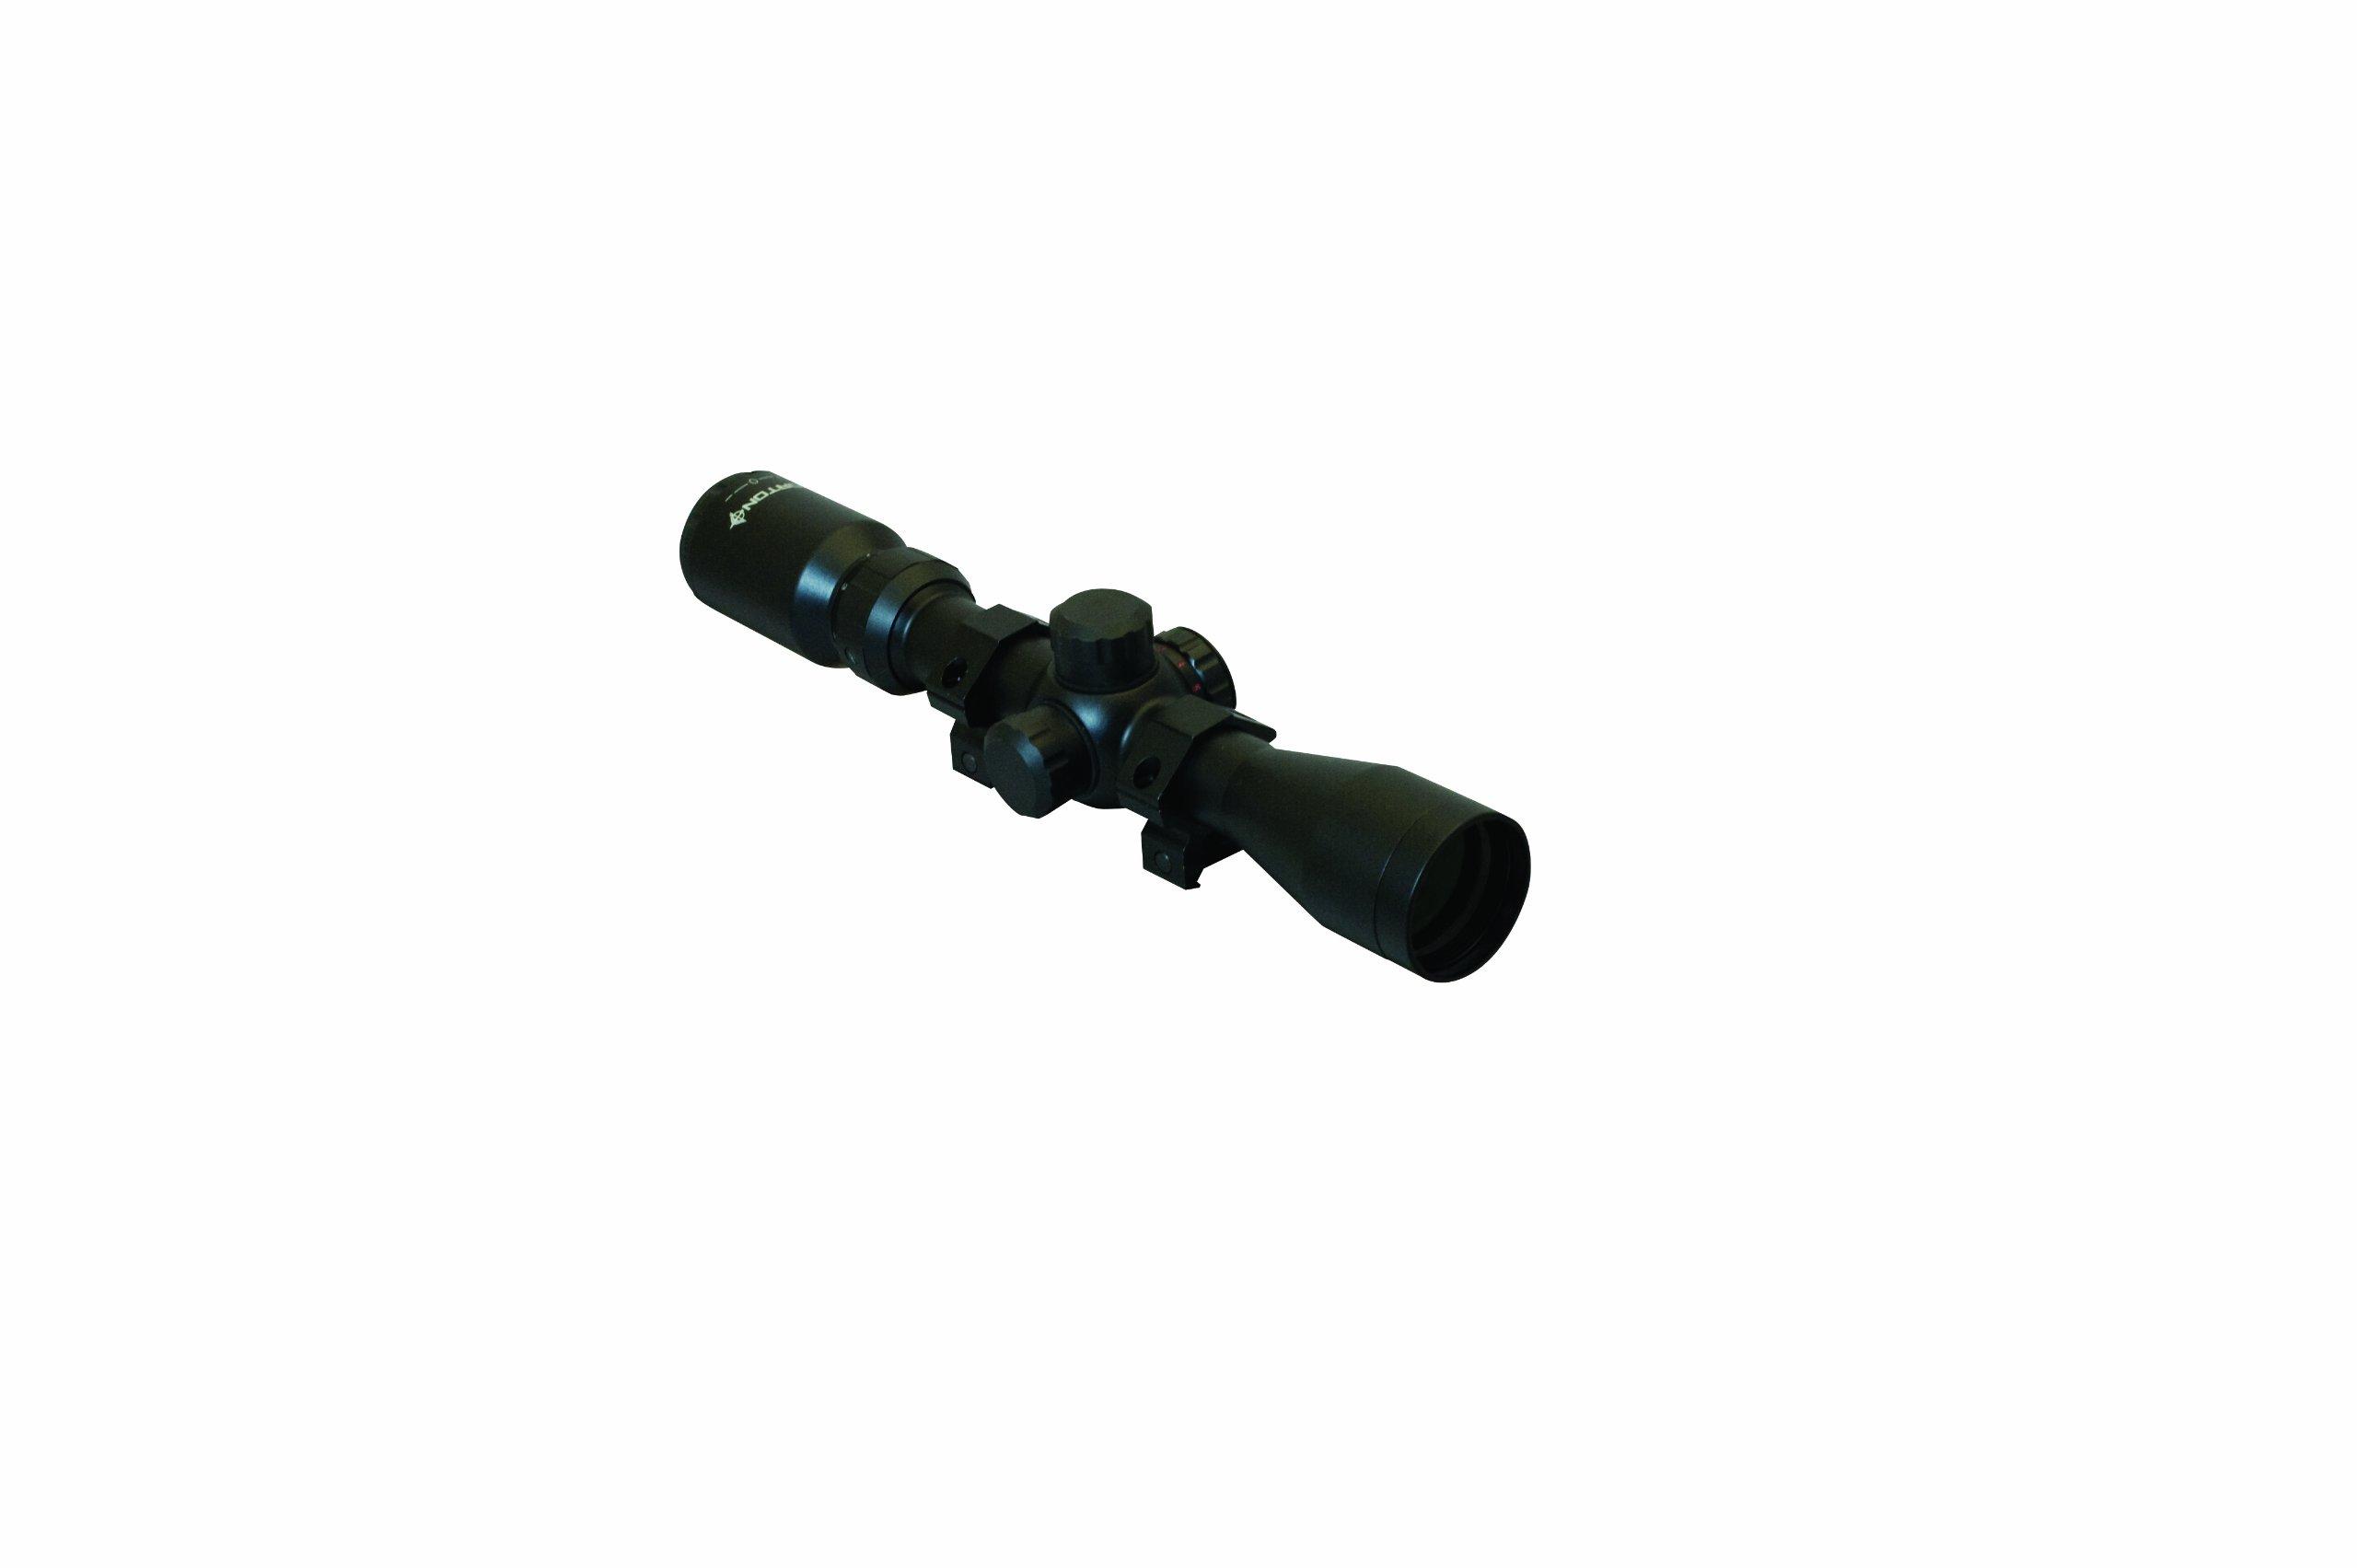 Horton 2-7x36 Variable Power Mult-a-Range Scope